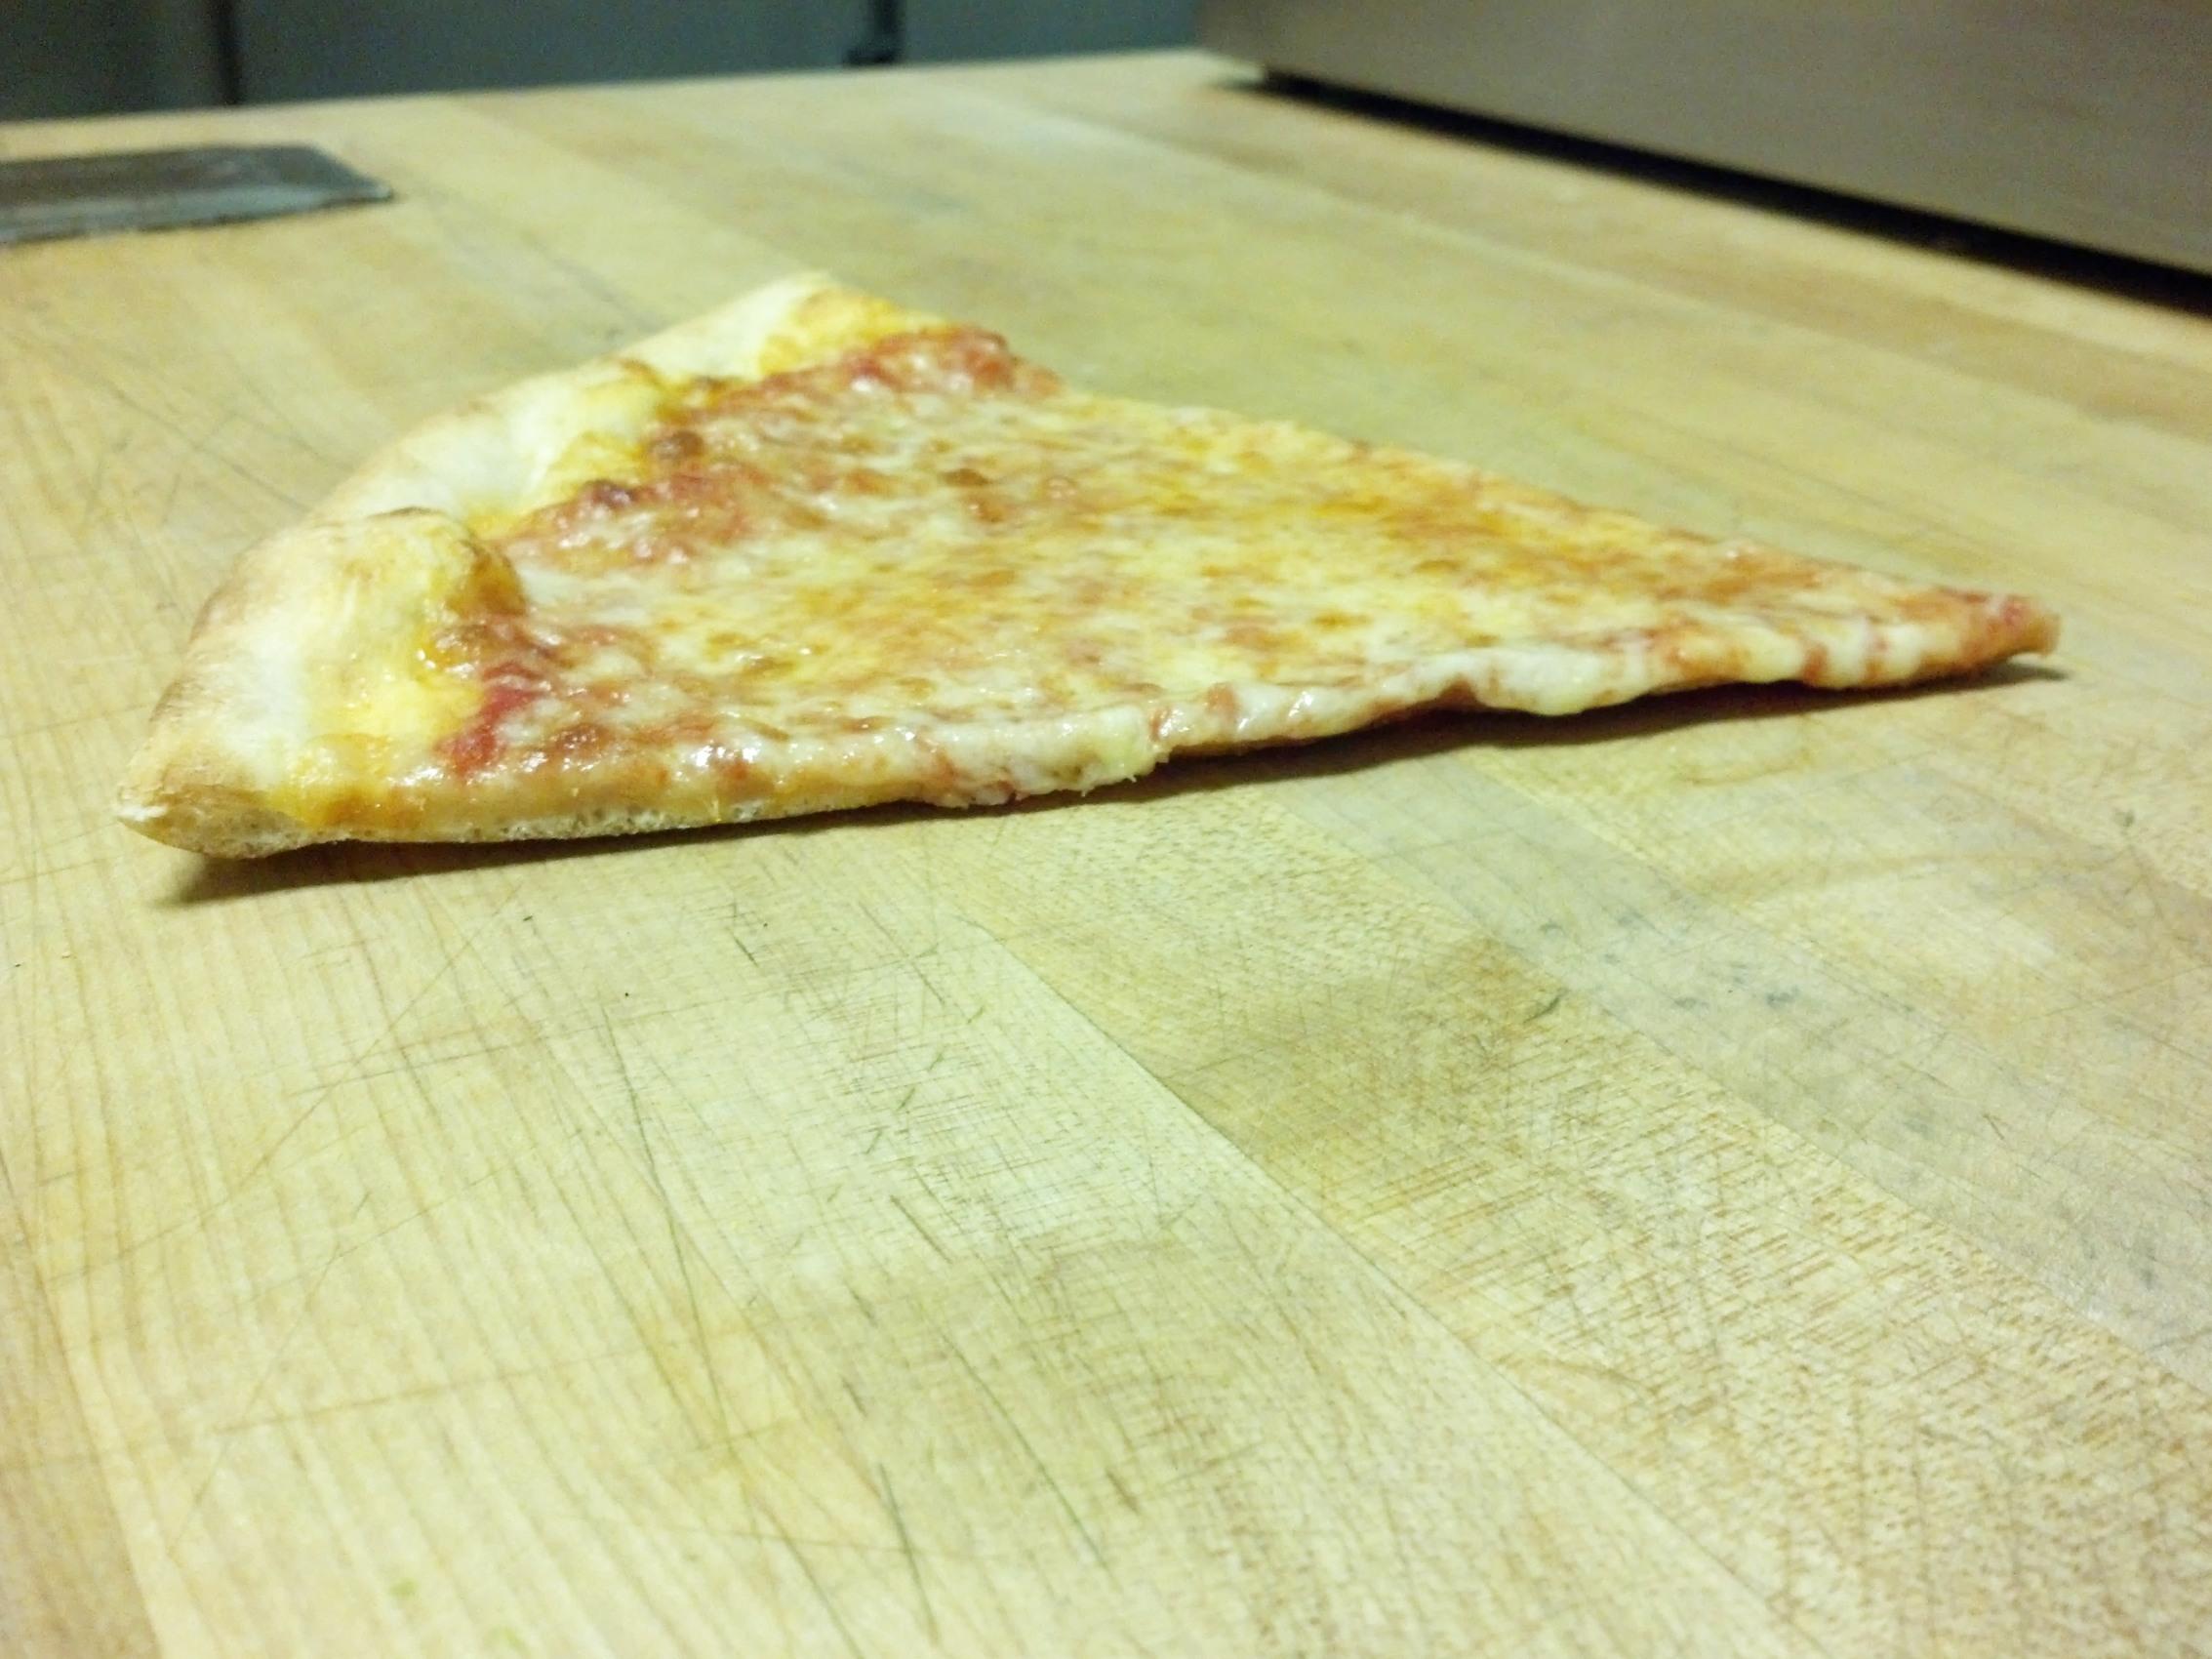 Neapolitan Cheese Slice Image